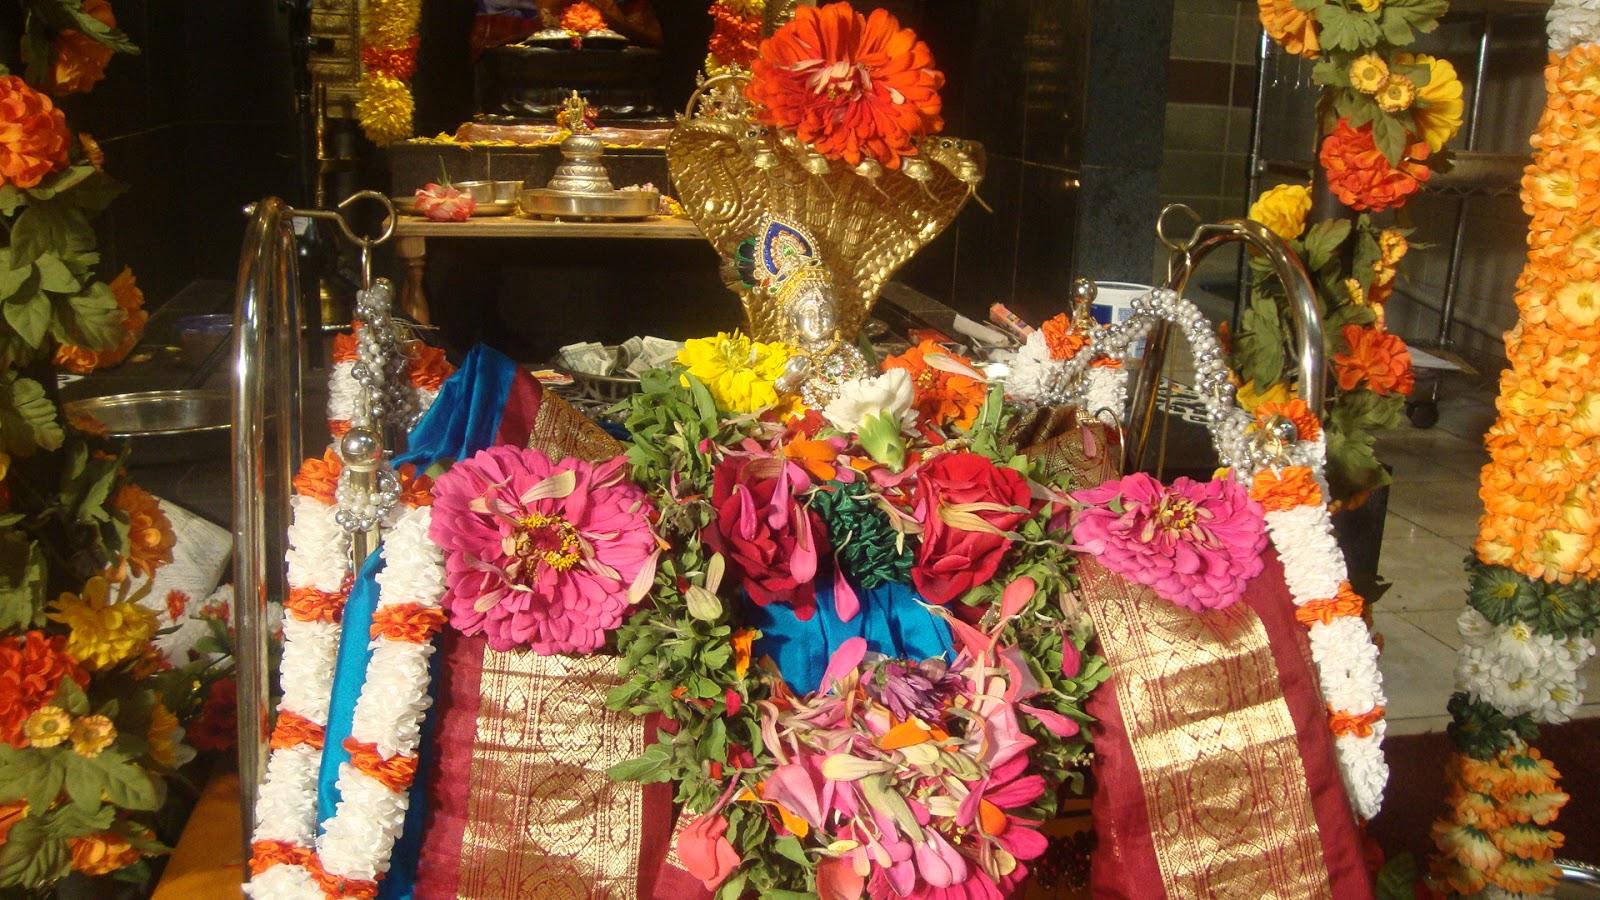 Naga devatha temple in bangalore dating 4